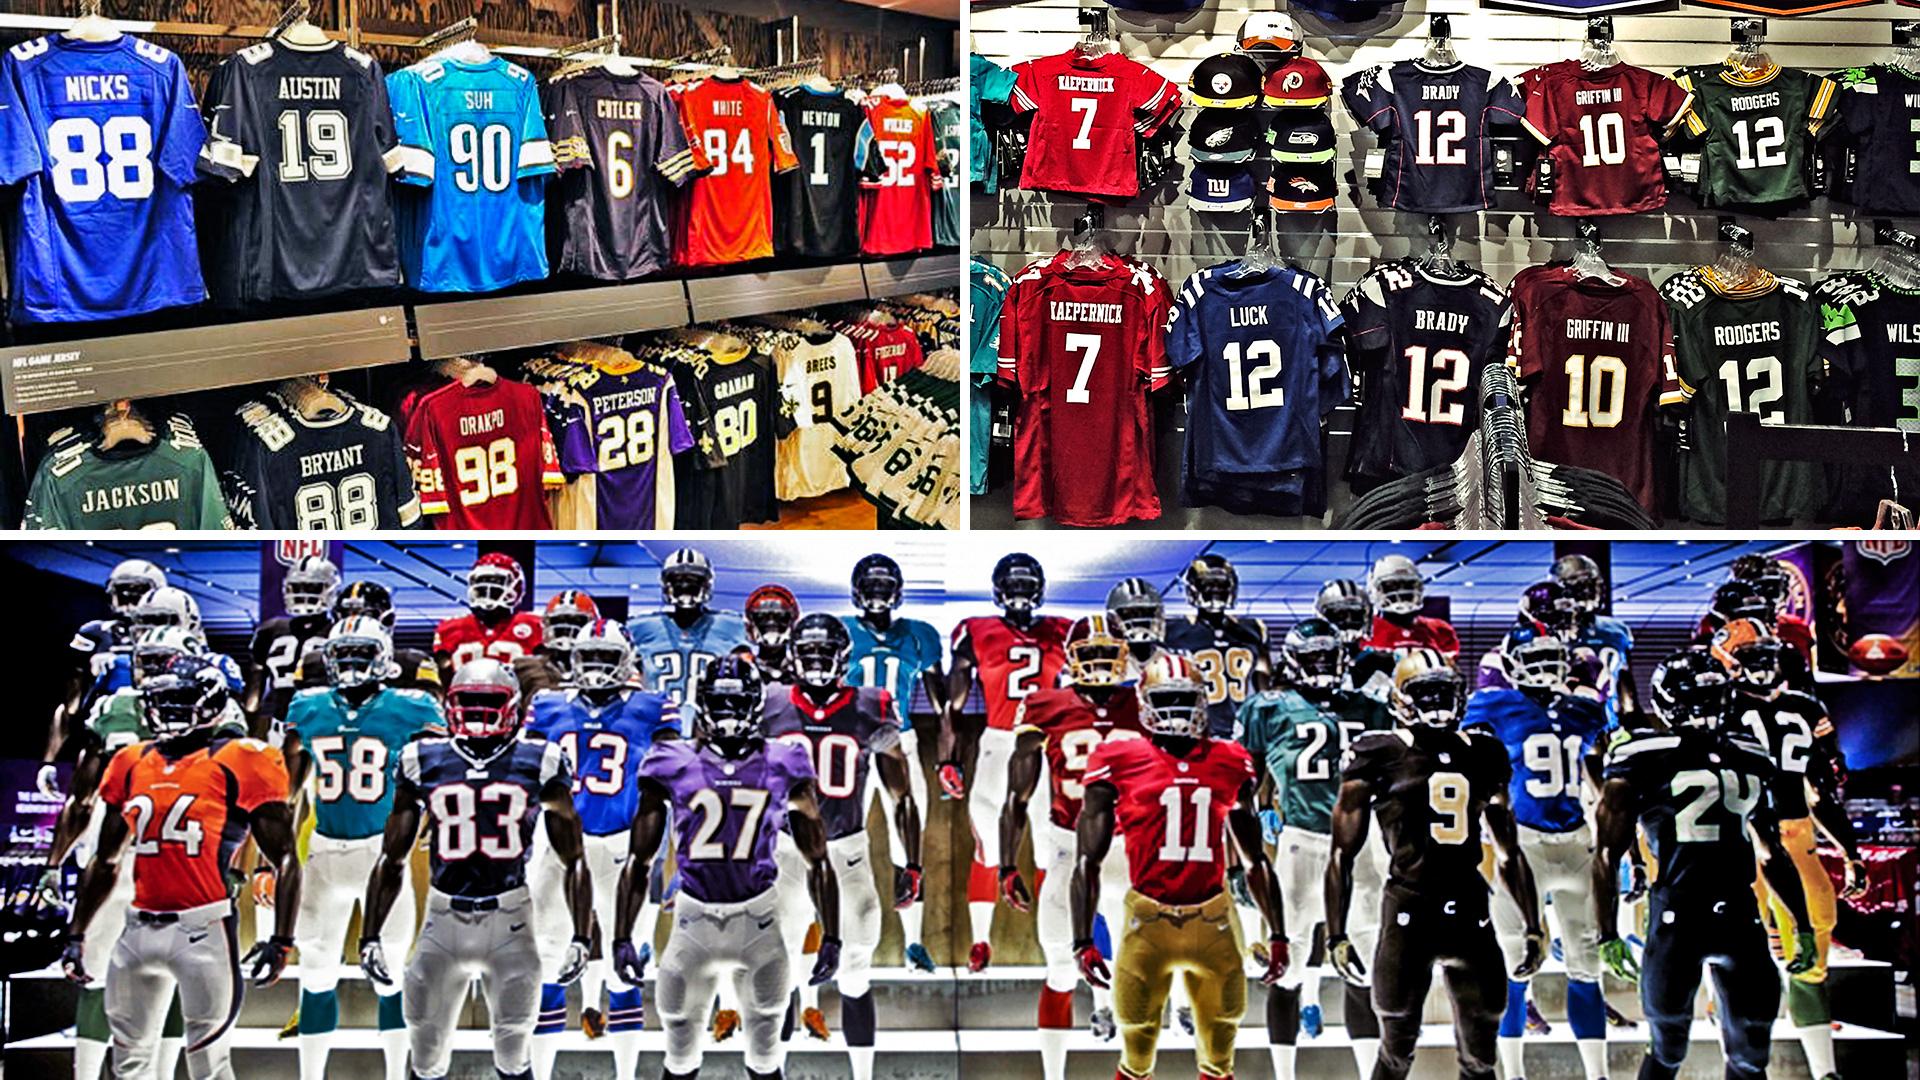 low price nfl jerseys